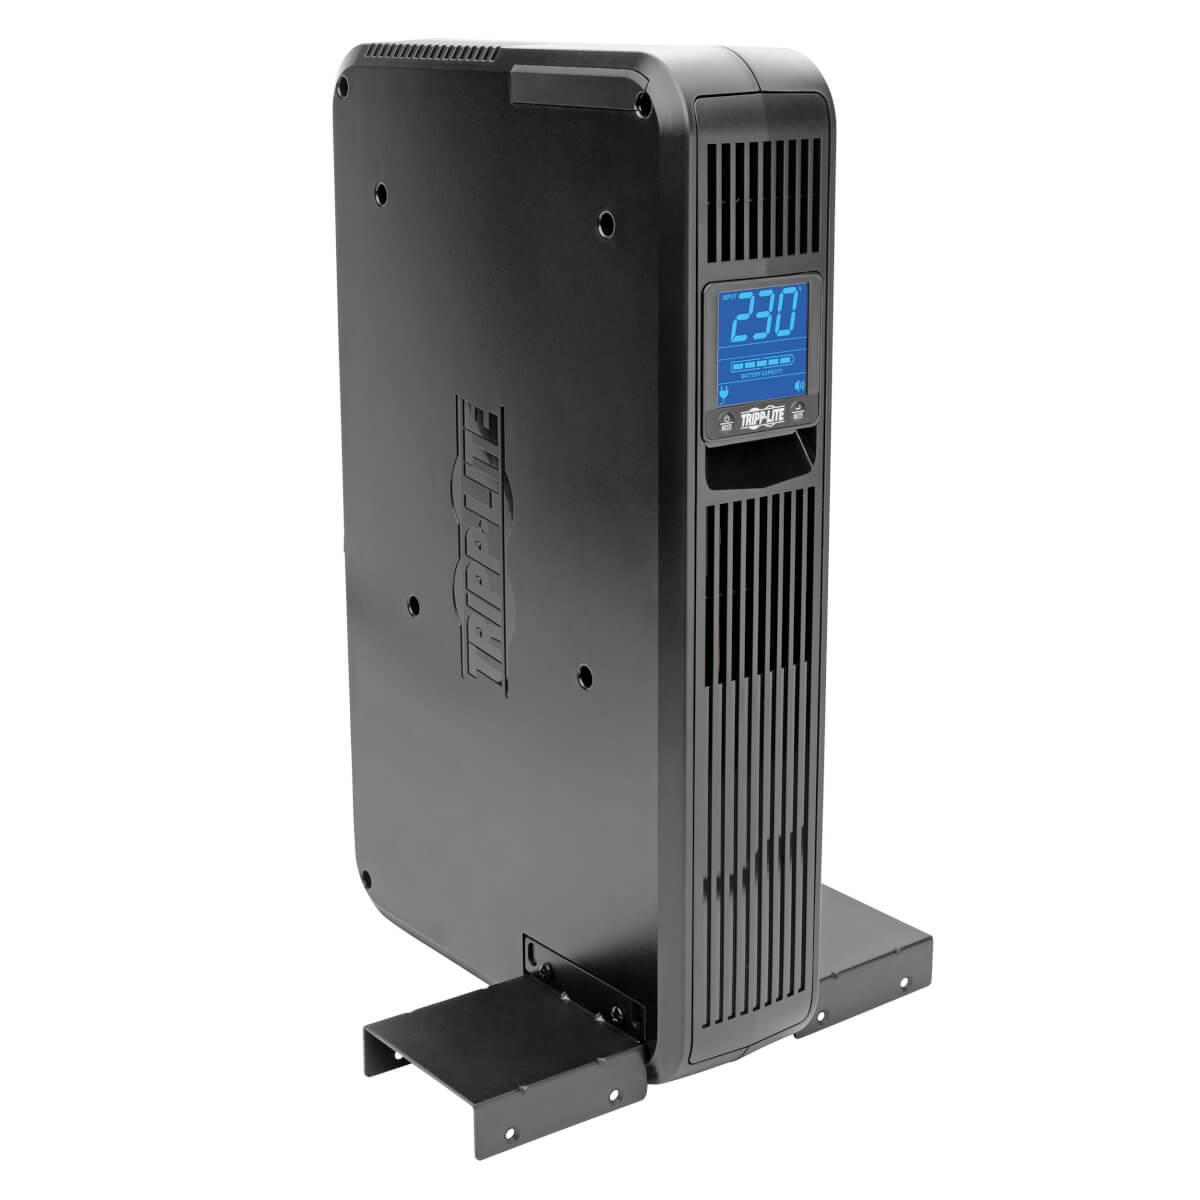 Tripp Lite provee energía segura con la nueva UPS SmartPro SMX1500LCD